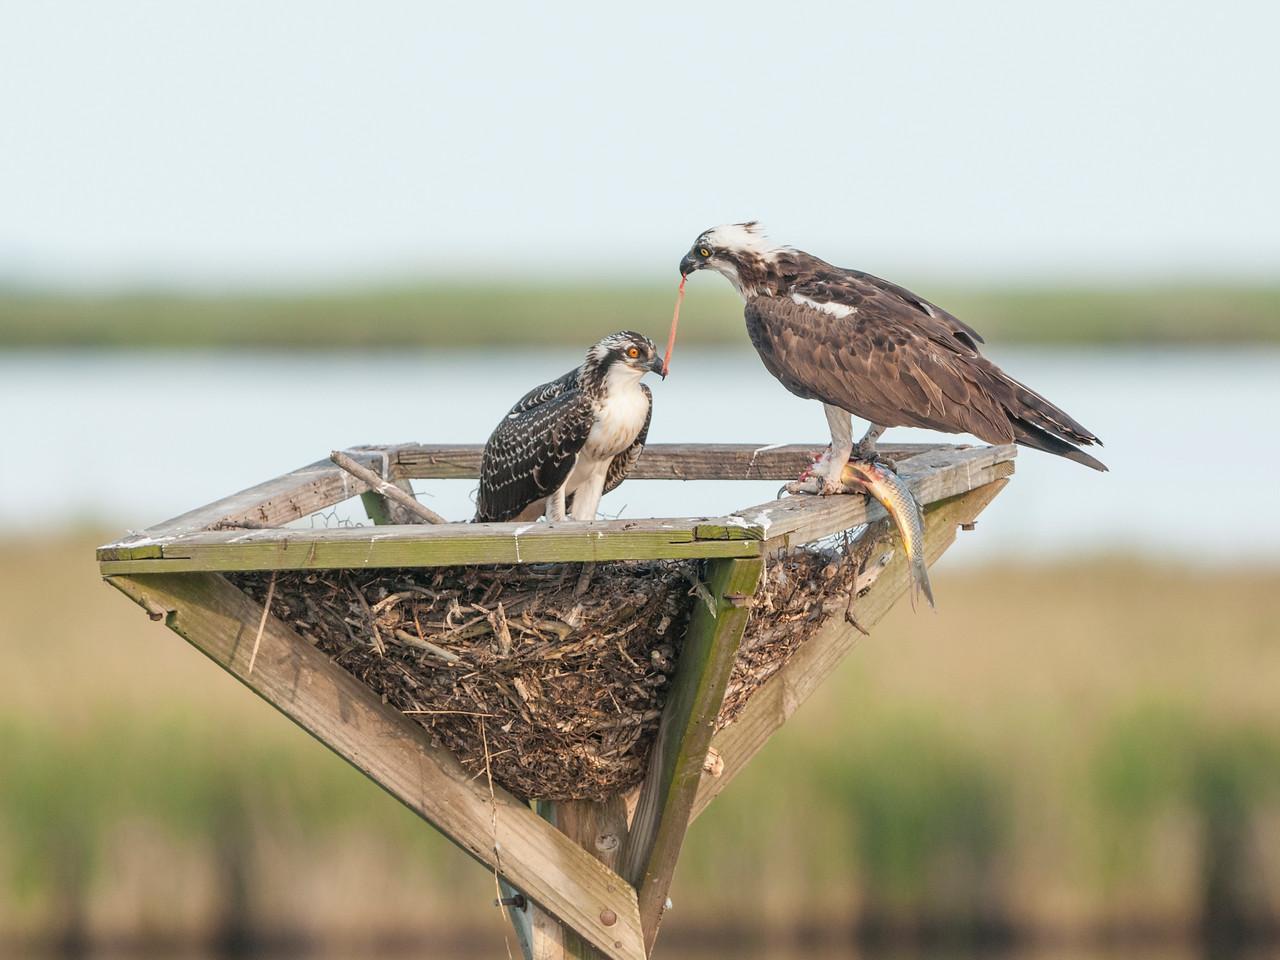 Osprey Mother Feeding Chick